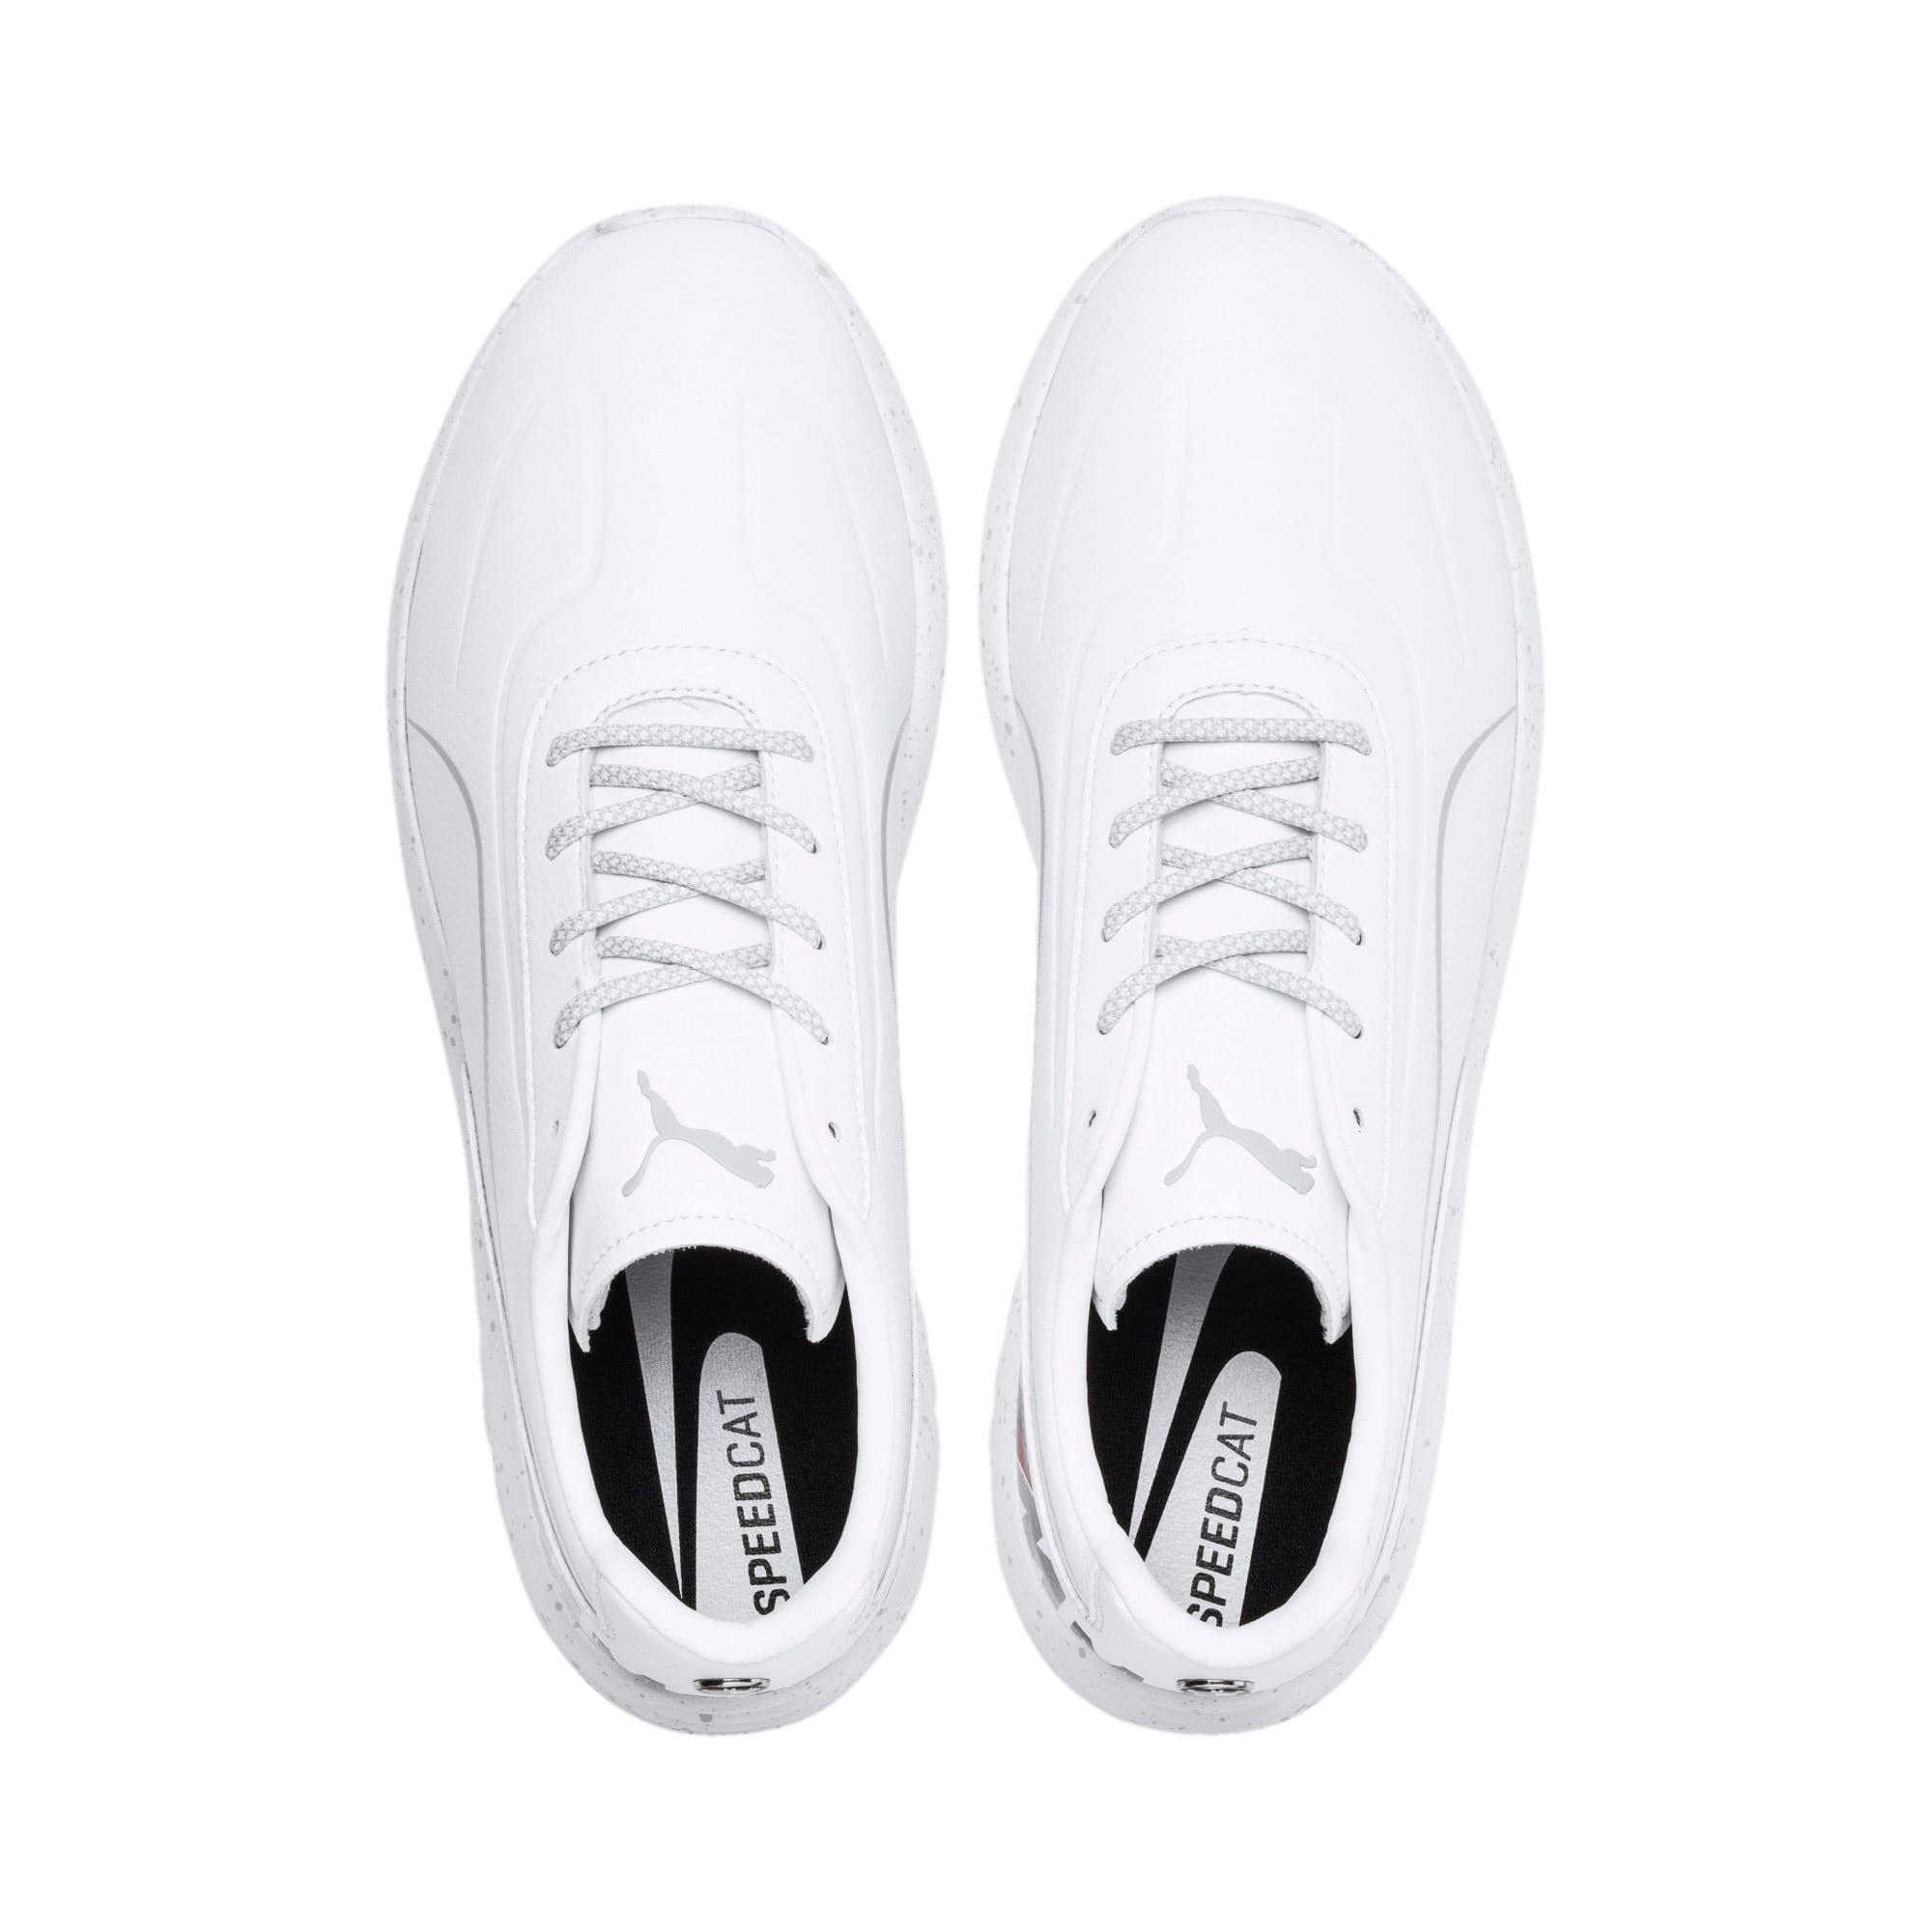 Thumbnail 6 of BMW M Motorsport Speedcat Evo Shoes, Puma White-Puma White, medium